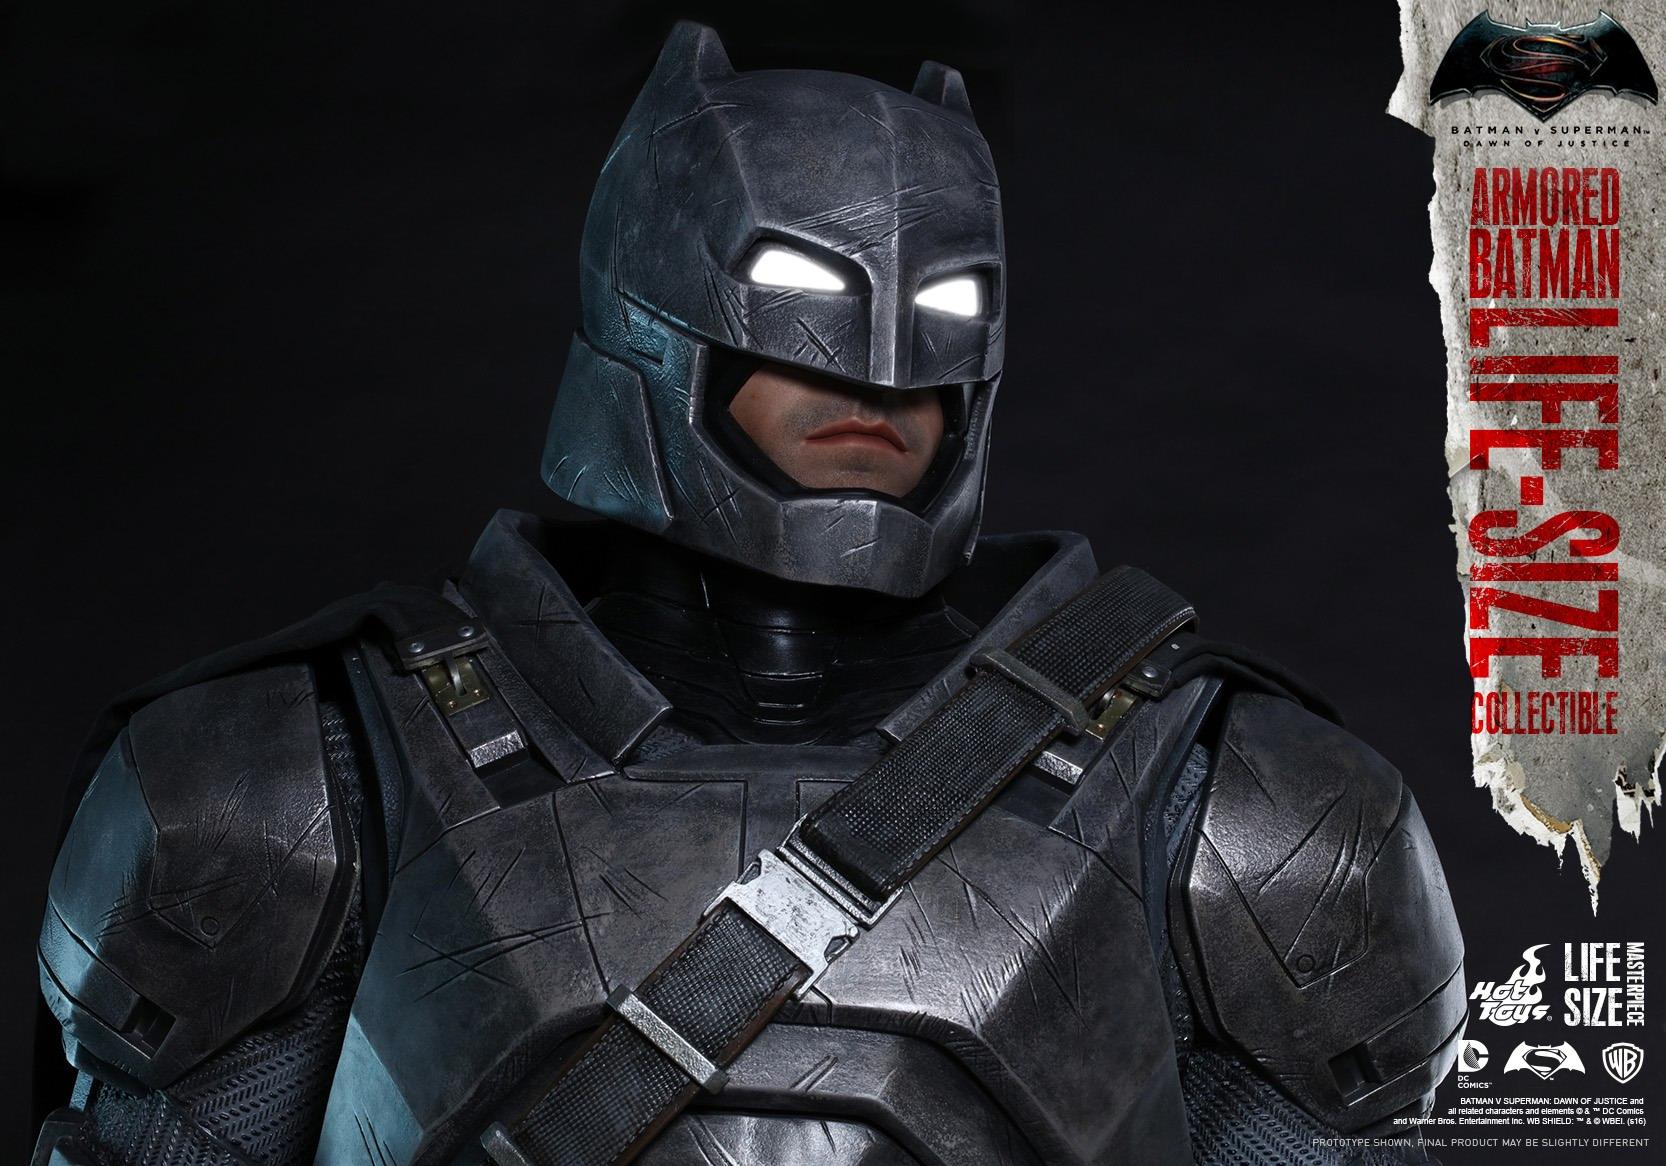 Hot Toys 蝙蝠侠大战超人 正义黎明 真人比例 蝙蝠侠重甲版 雕像 LMS001 玩家社区 专业的兵人模型论坛